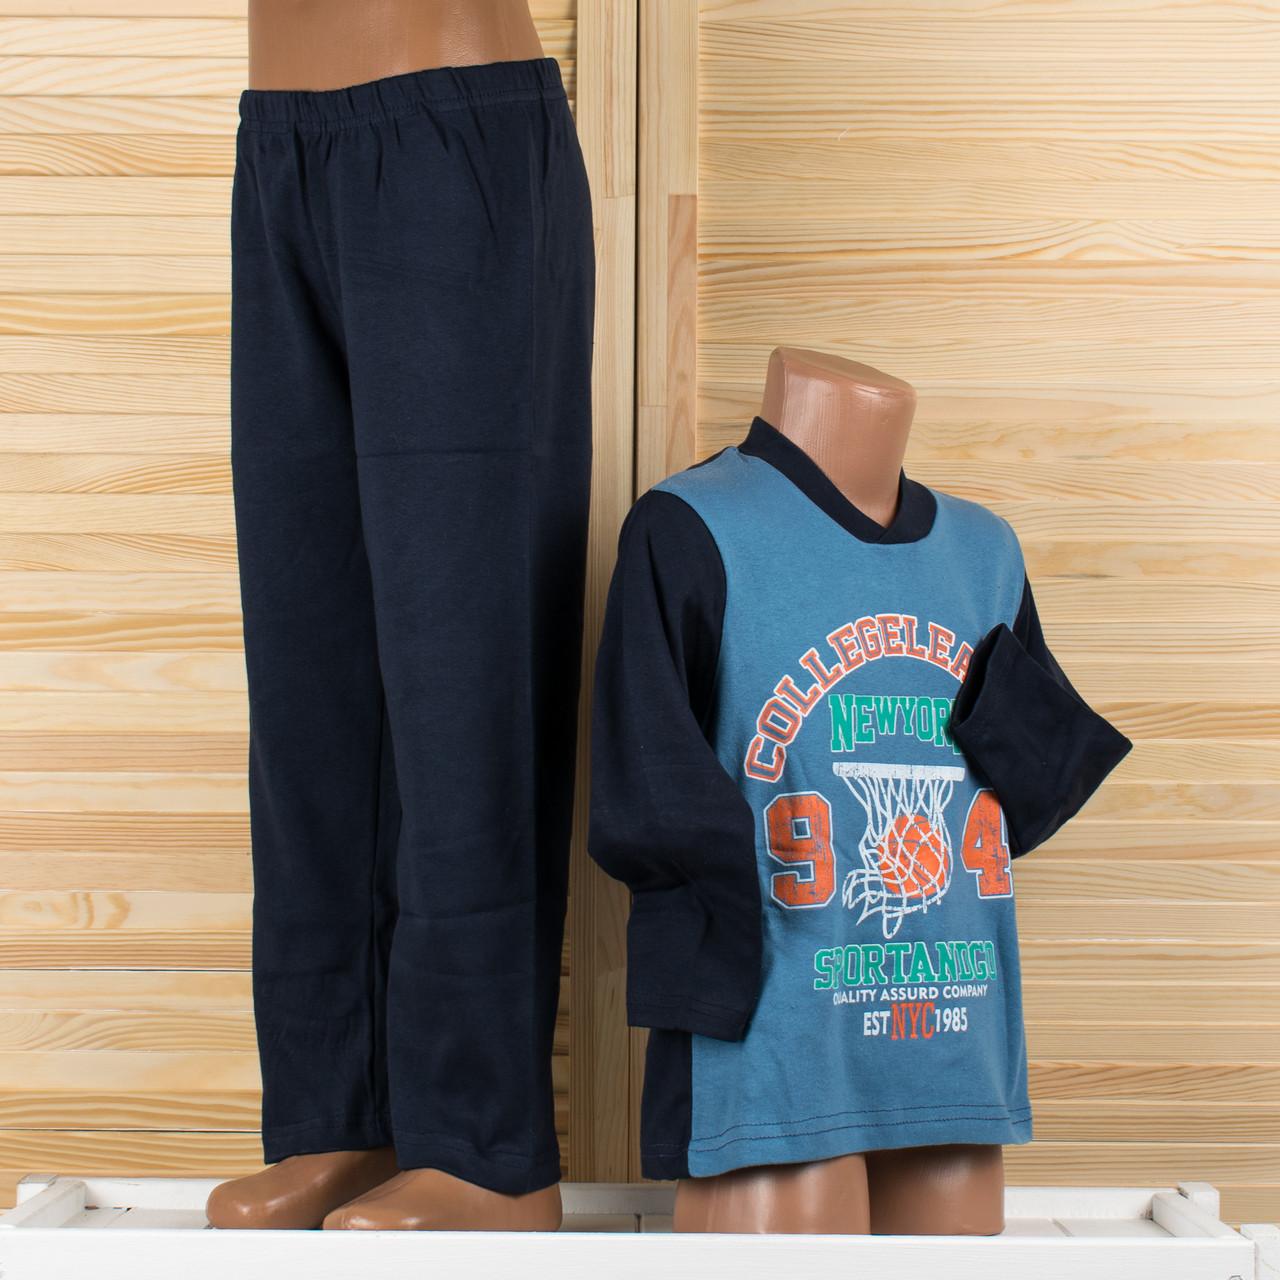 Детская пижама на мальчика Турция. Moral 07-5 2/3. Размер на 2/3 года.